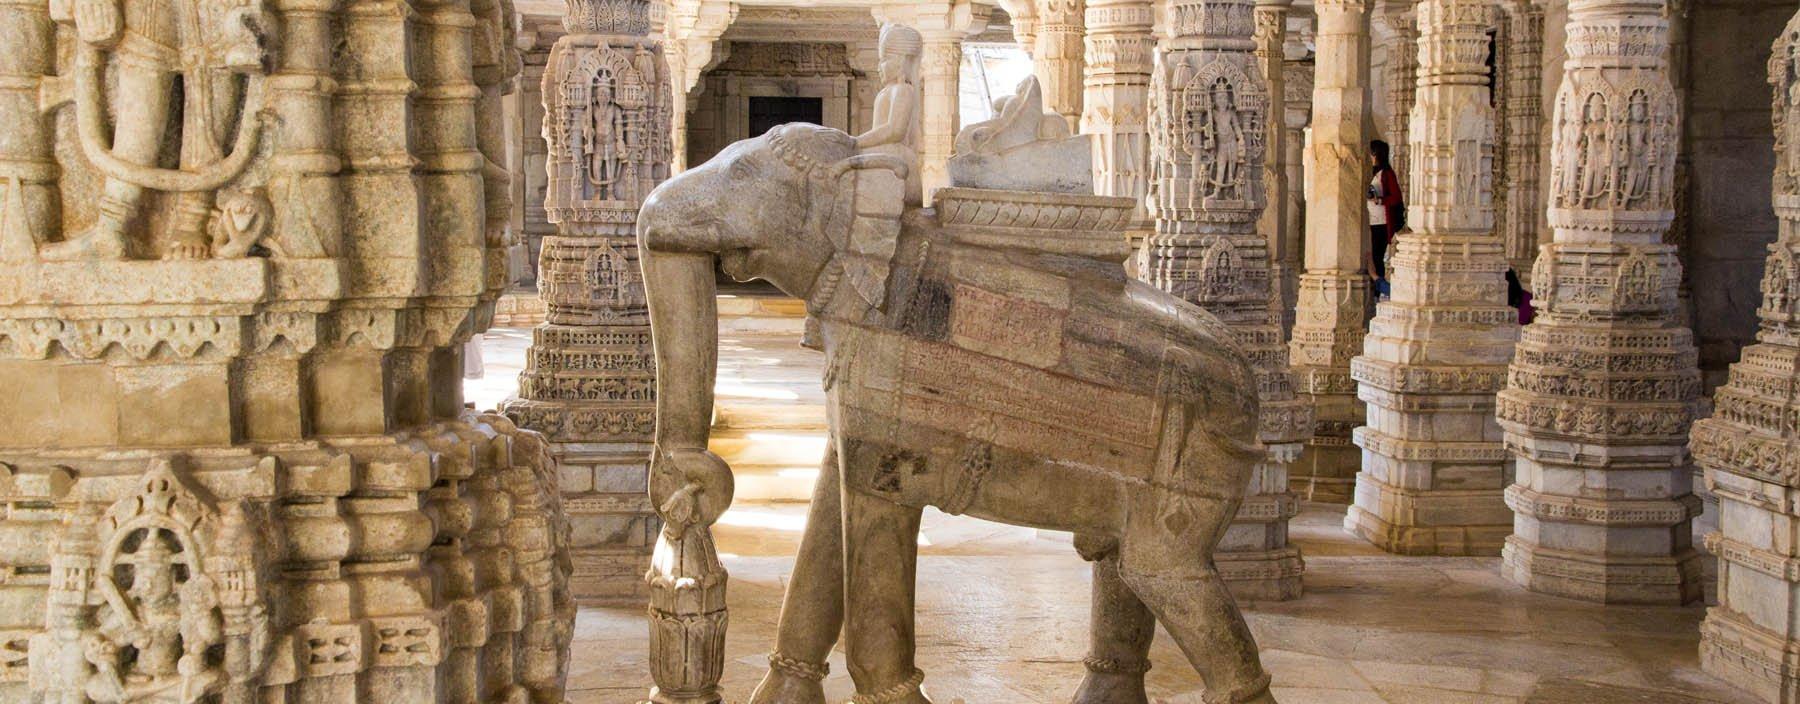 in, udaipur, jagdish temple.jpg